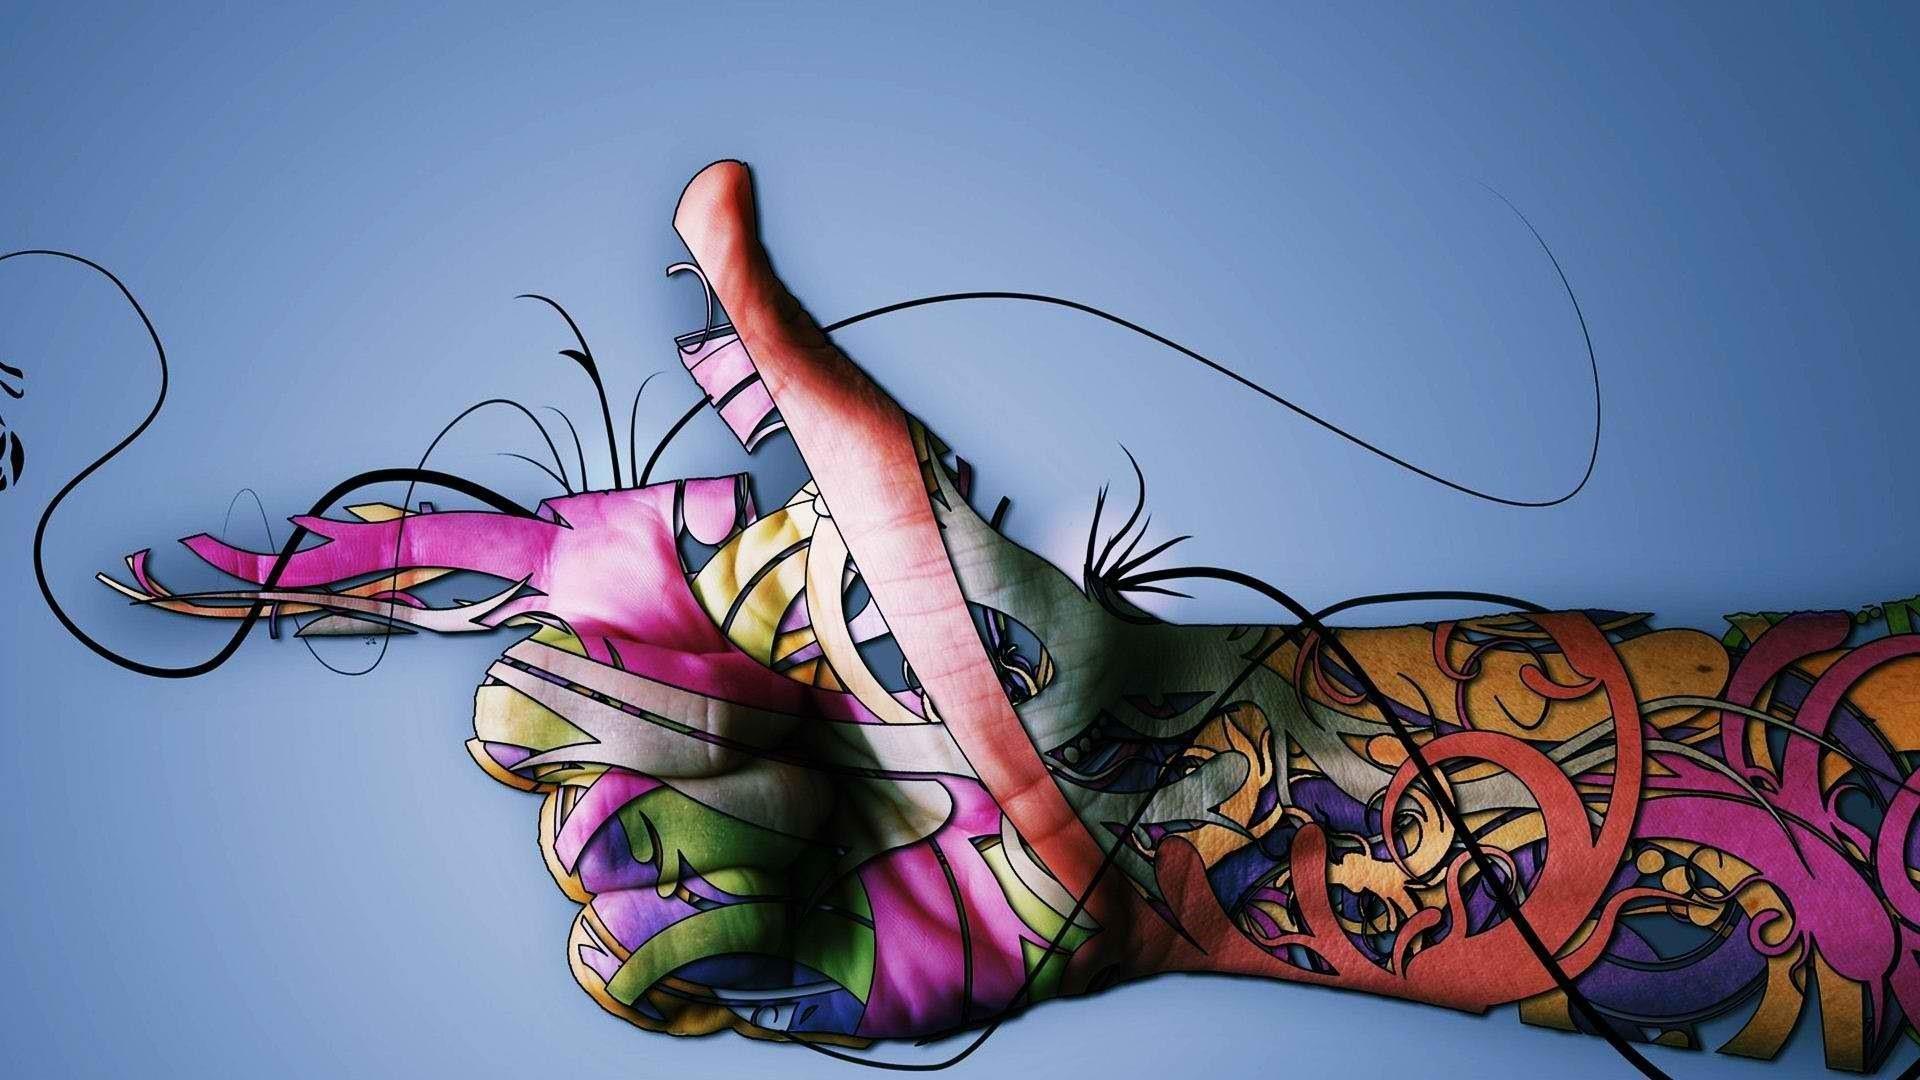 wallpaper tattoo colourful - photo #42